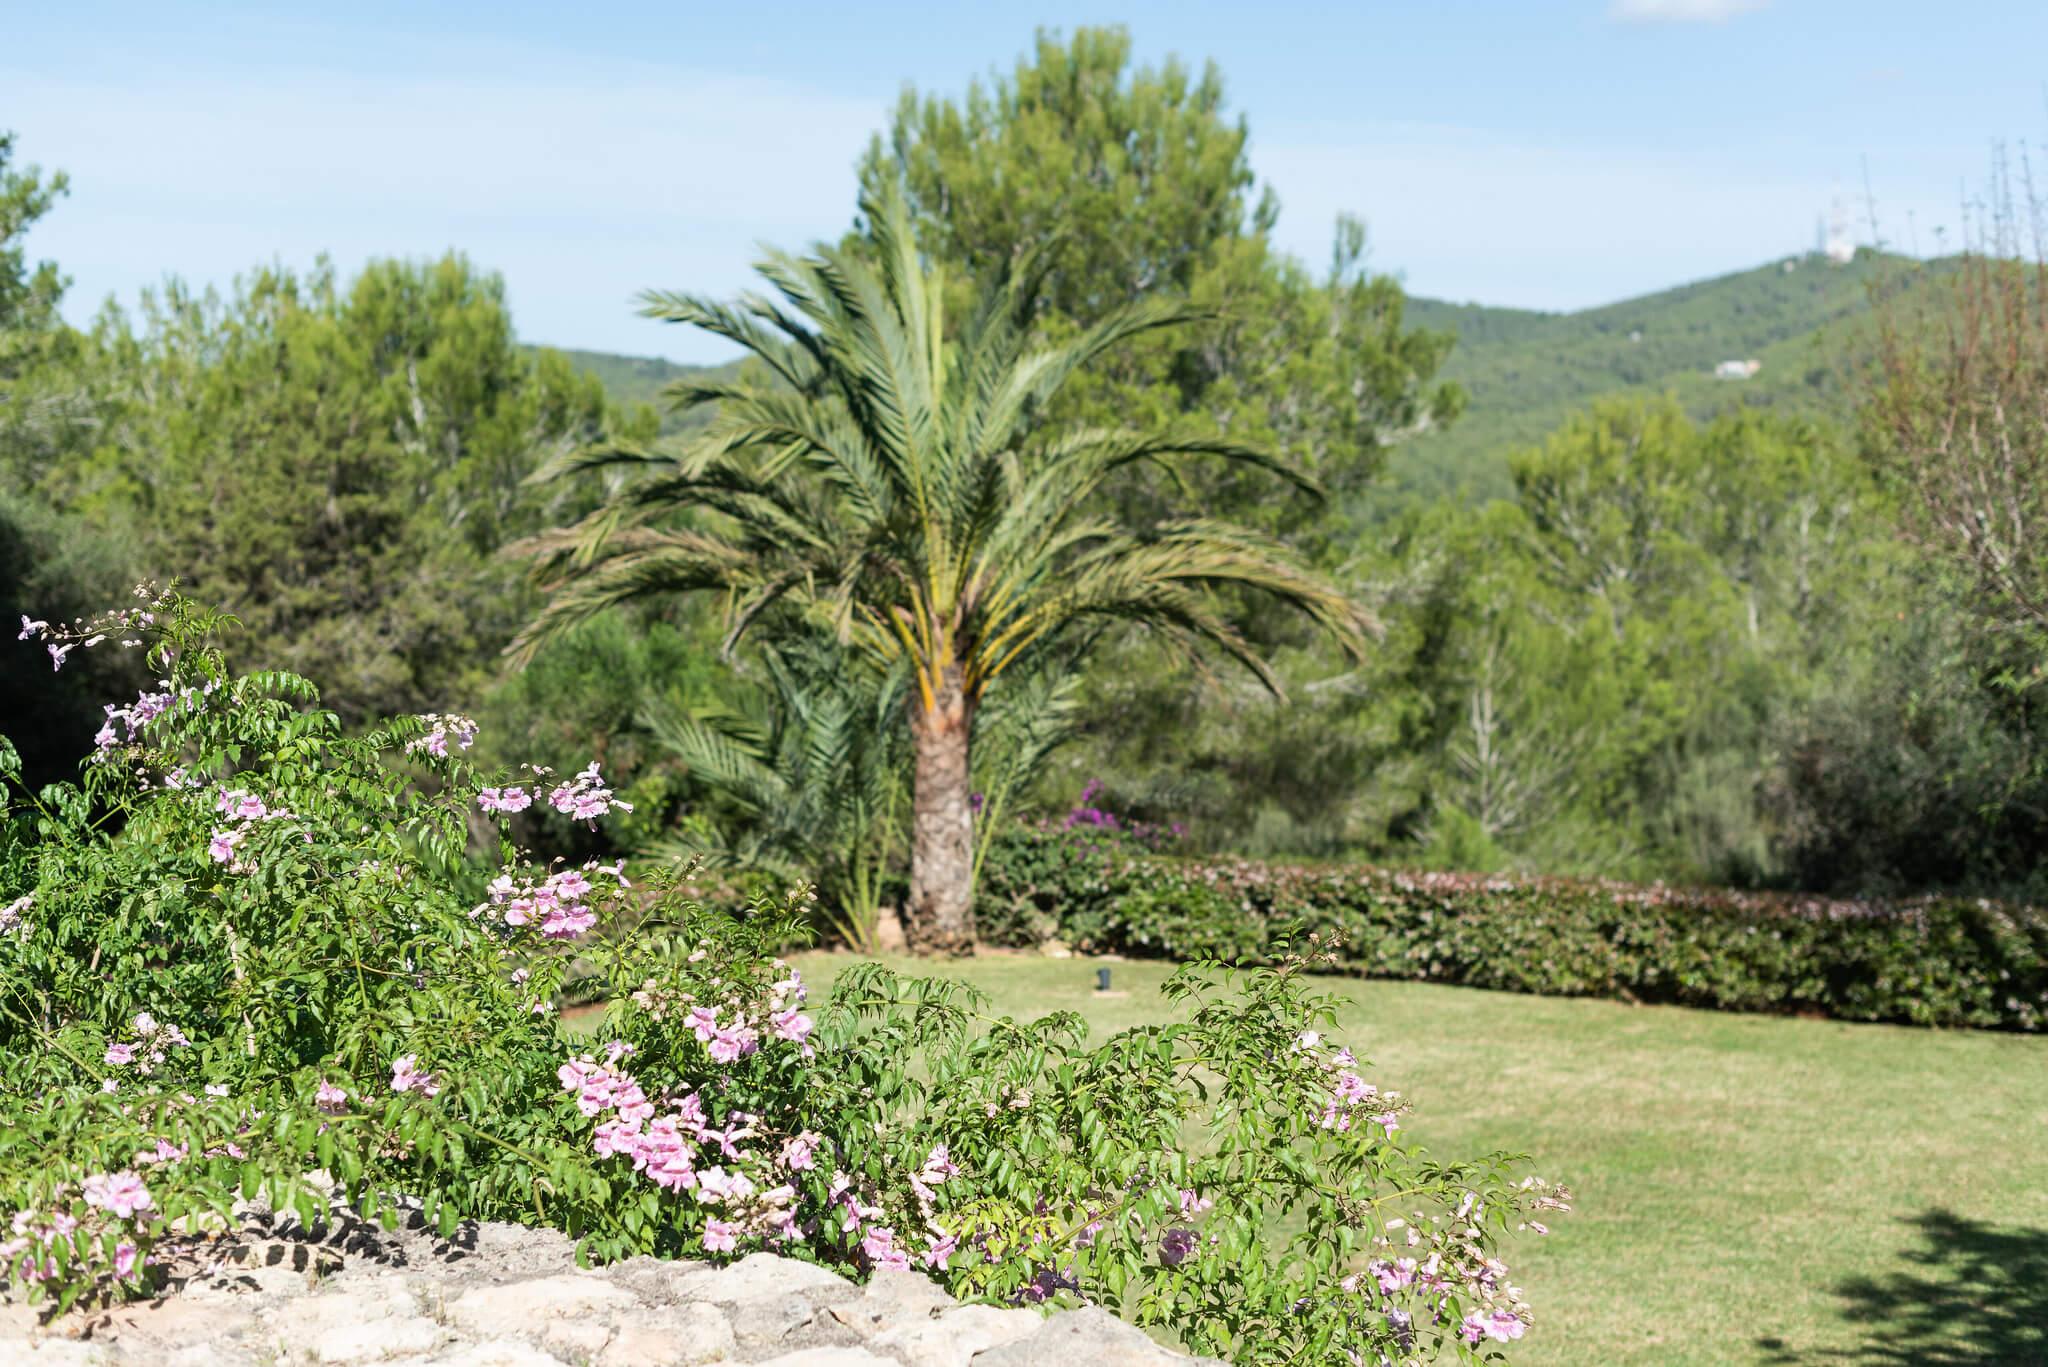 https://www.white-ibiza.com/wp-content/uploads/2020/06/white-ibiza-villas-casa-arabella-exterior-garden.jpg